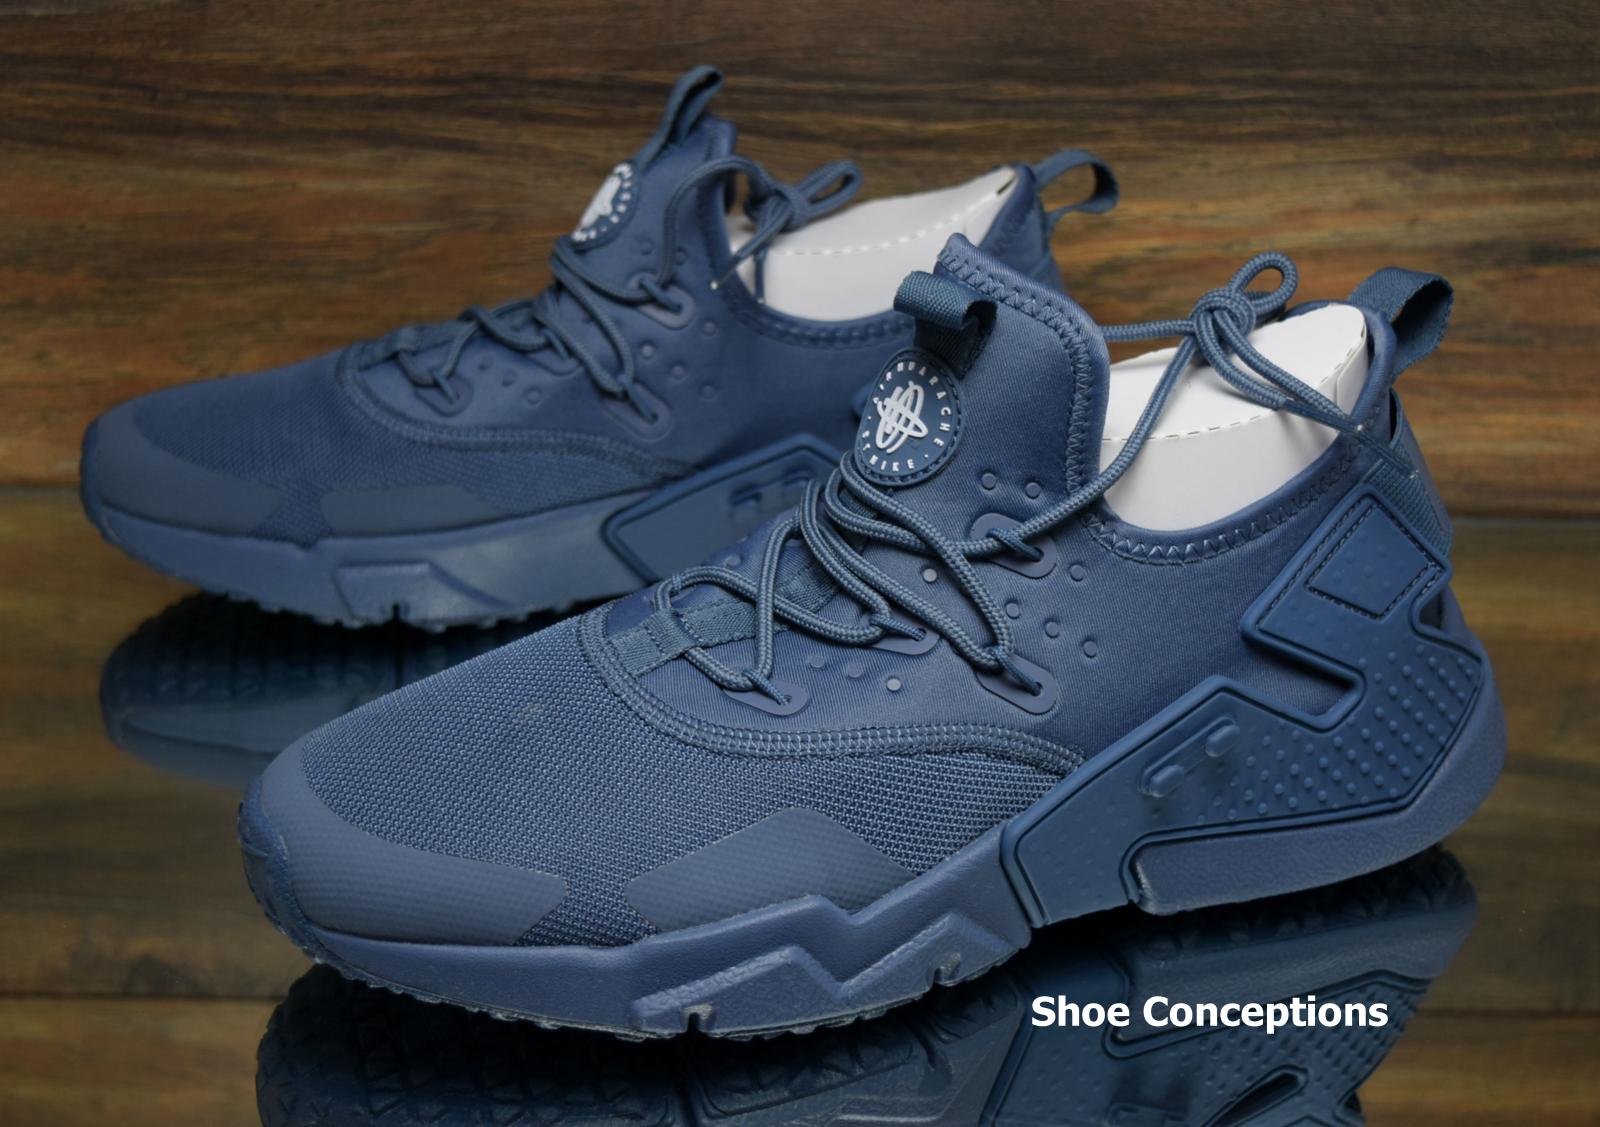 87412748eacde Спортивная обувь для мужчины Nike Air Huarache Drift Diffused Blue  AH7334-400 Men s Shoes Multi Siz - 163030578675 - купить на eBay.com (США)  с доставкой в ...